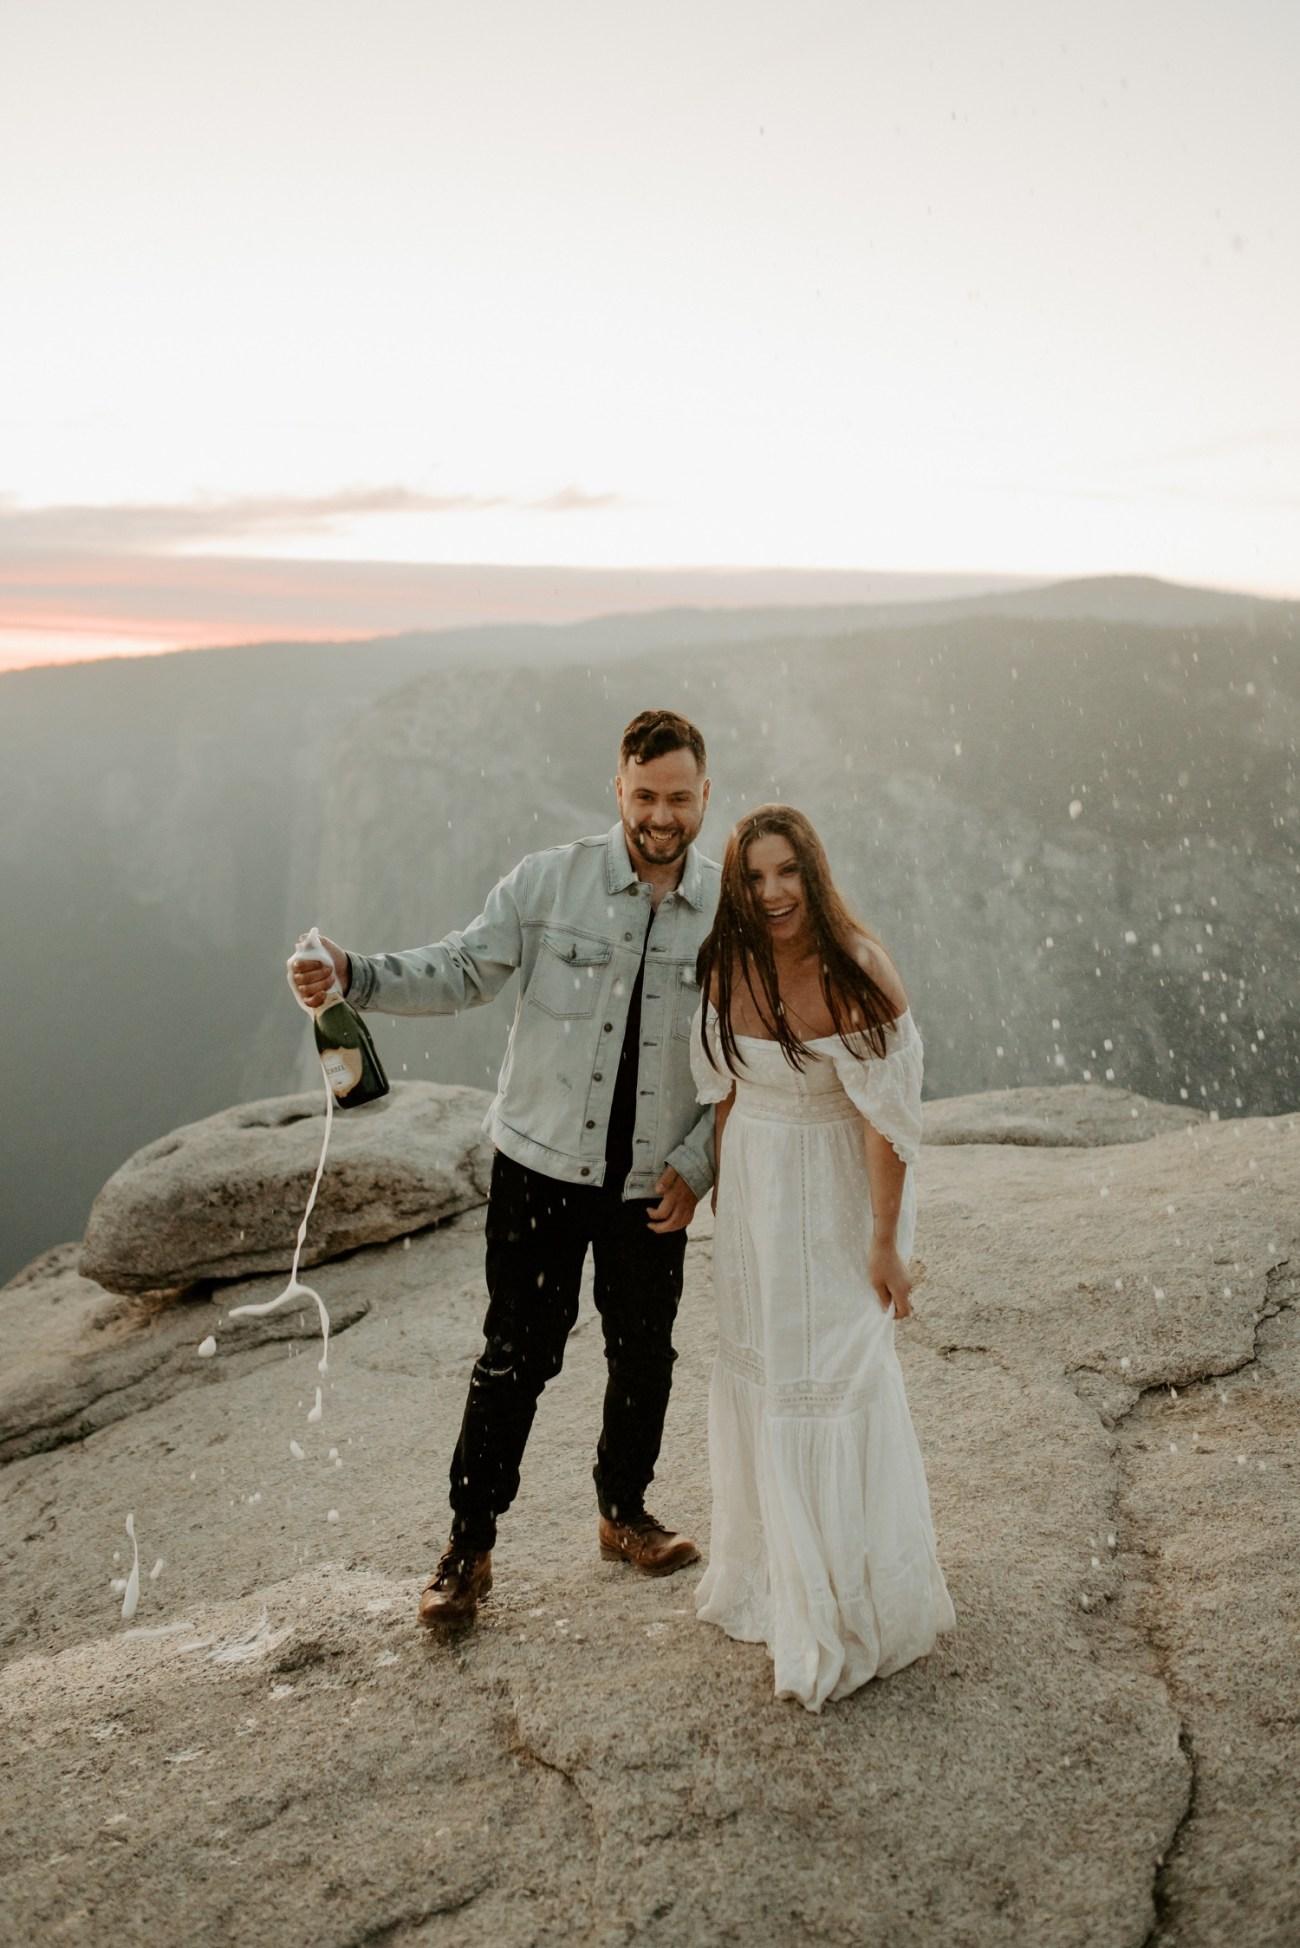 Yosemite Taft Point Engagement Session California Wedding Photographer Anais Possamai Photography 45